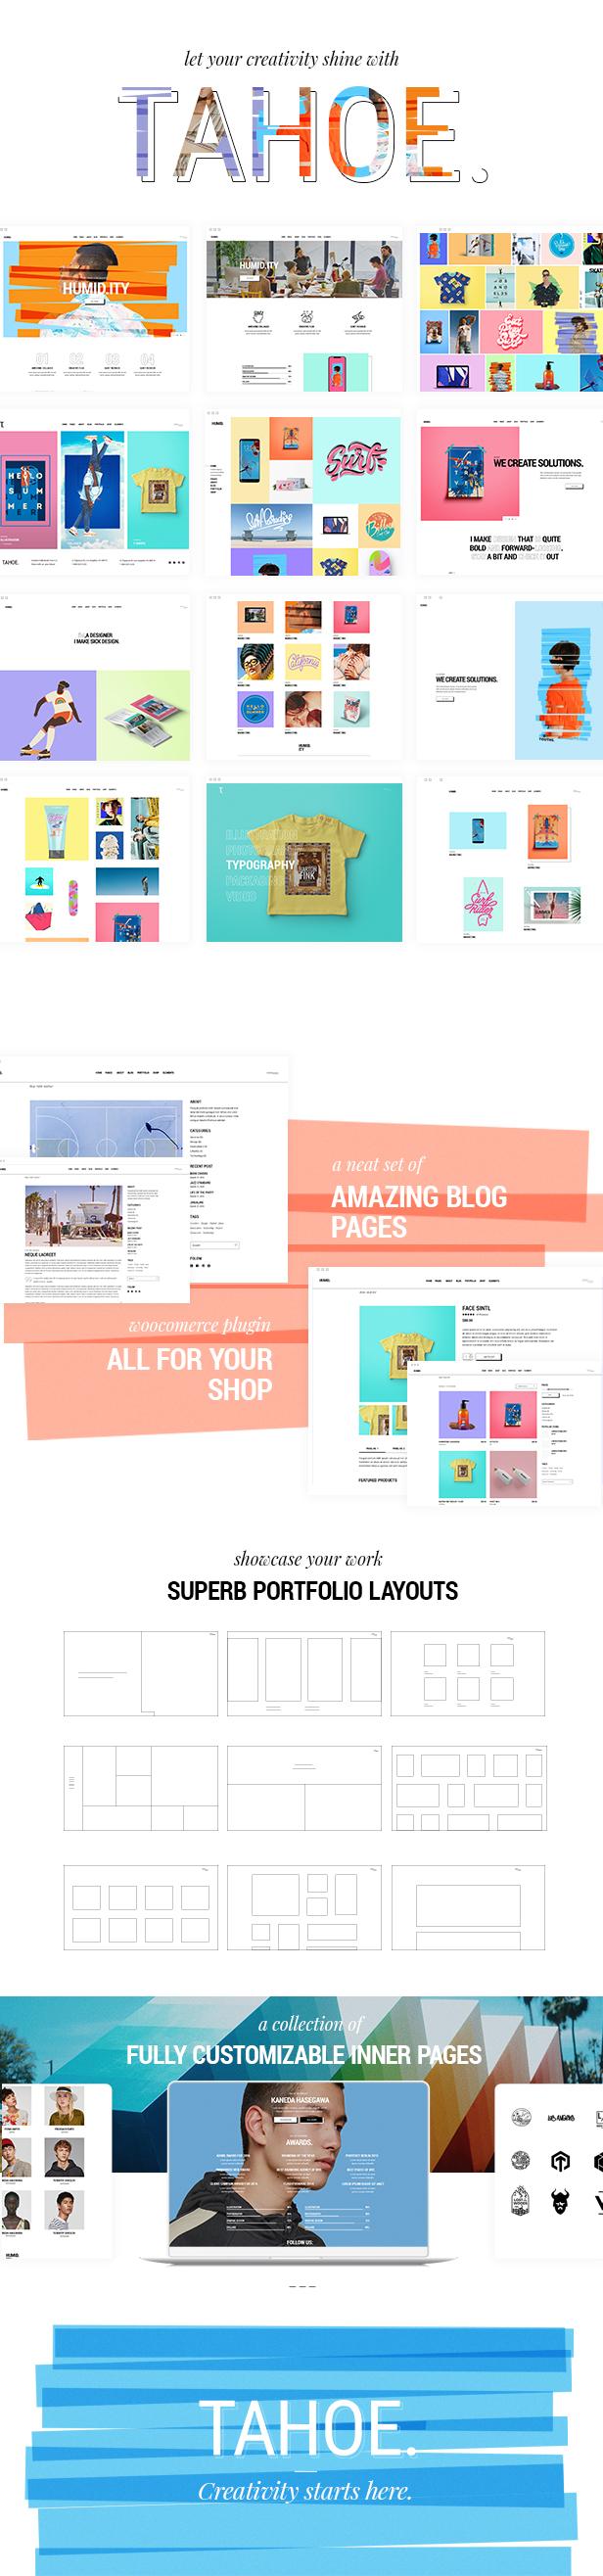 Tahoe - Portfolio Theme for Creatives and Freelancers - 1